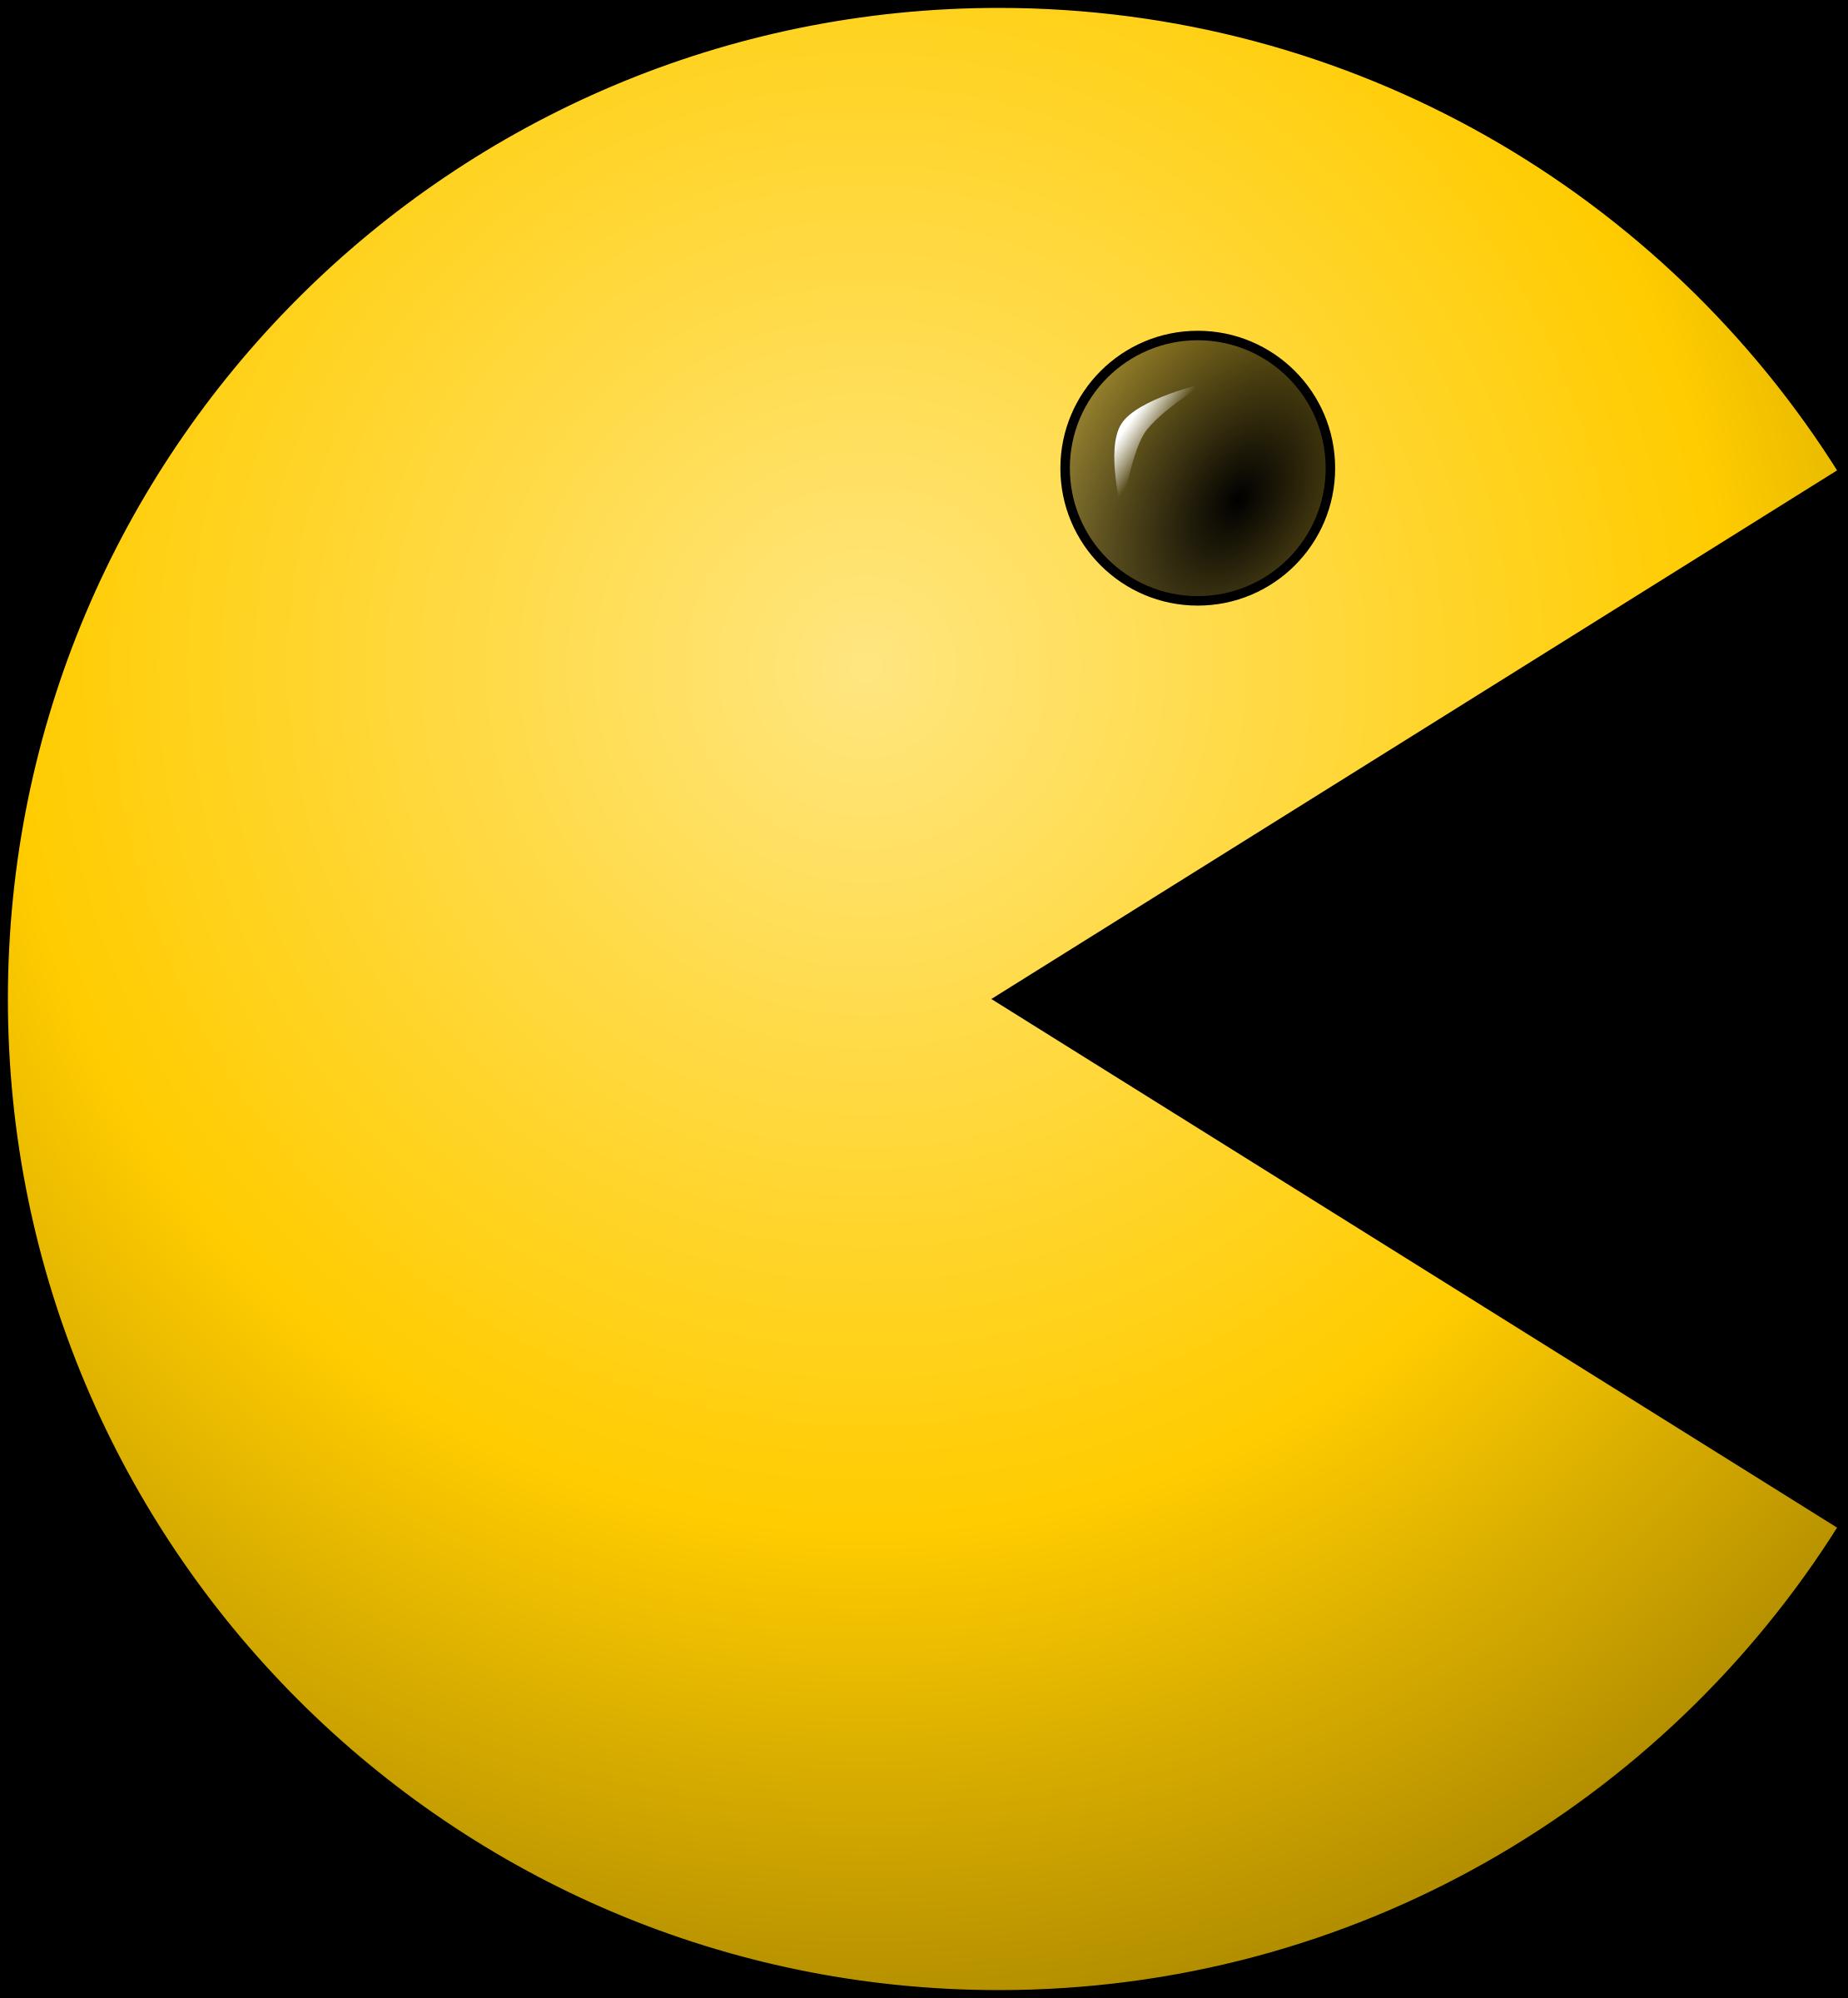 Pacman flash player game